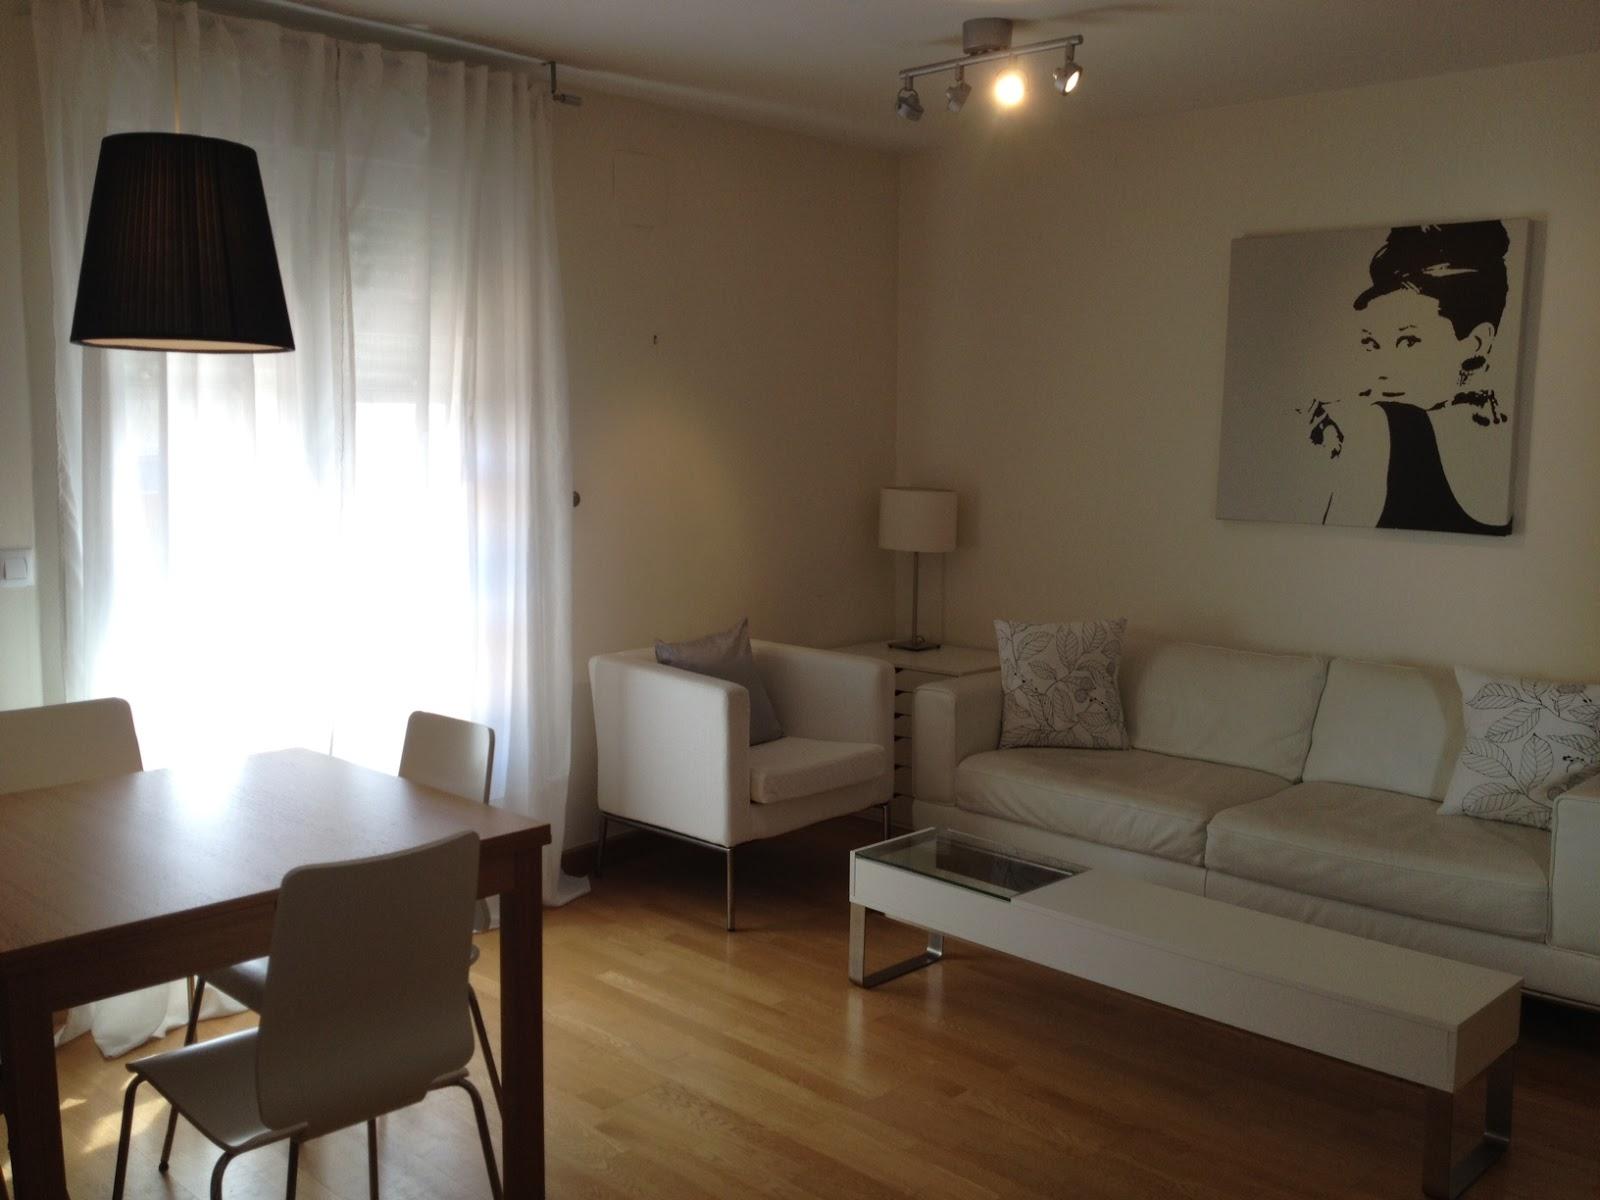 Calle harinas n mero 20 alquiler sevilla centro for Alquiler de apartamentos en sevilla centro